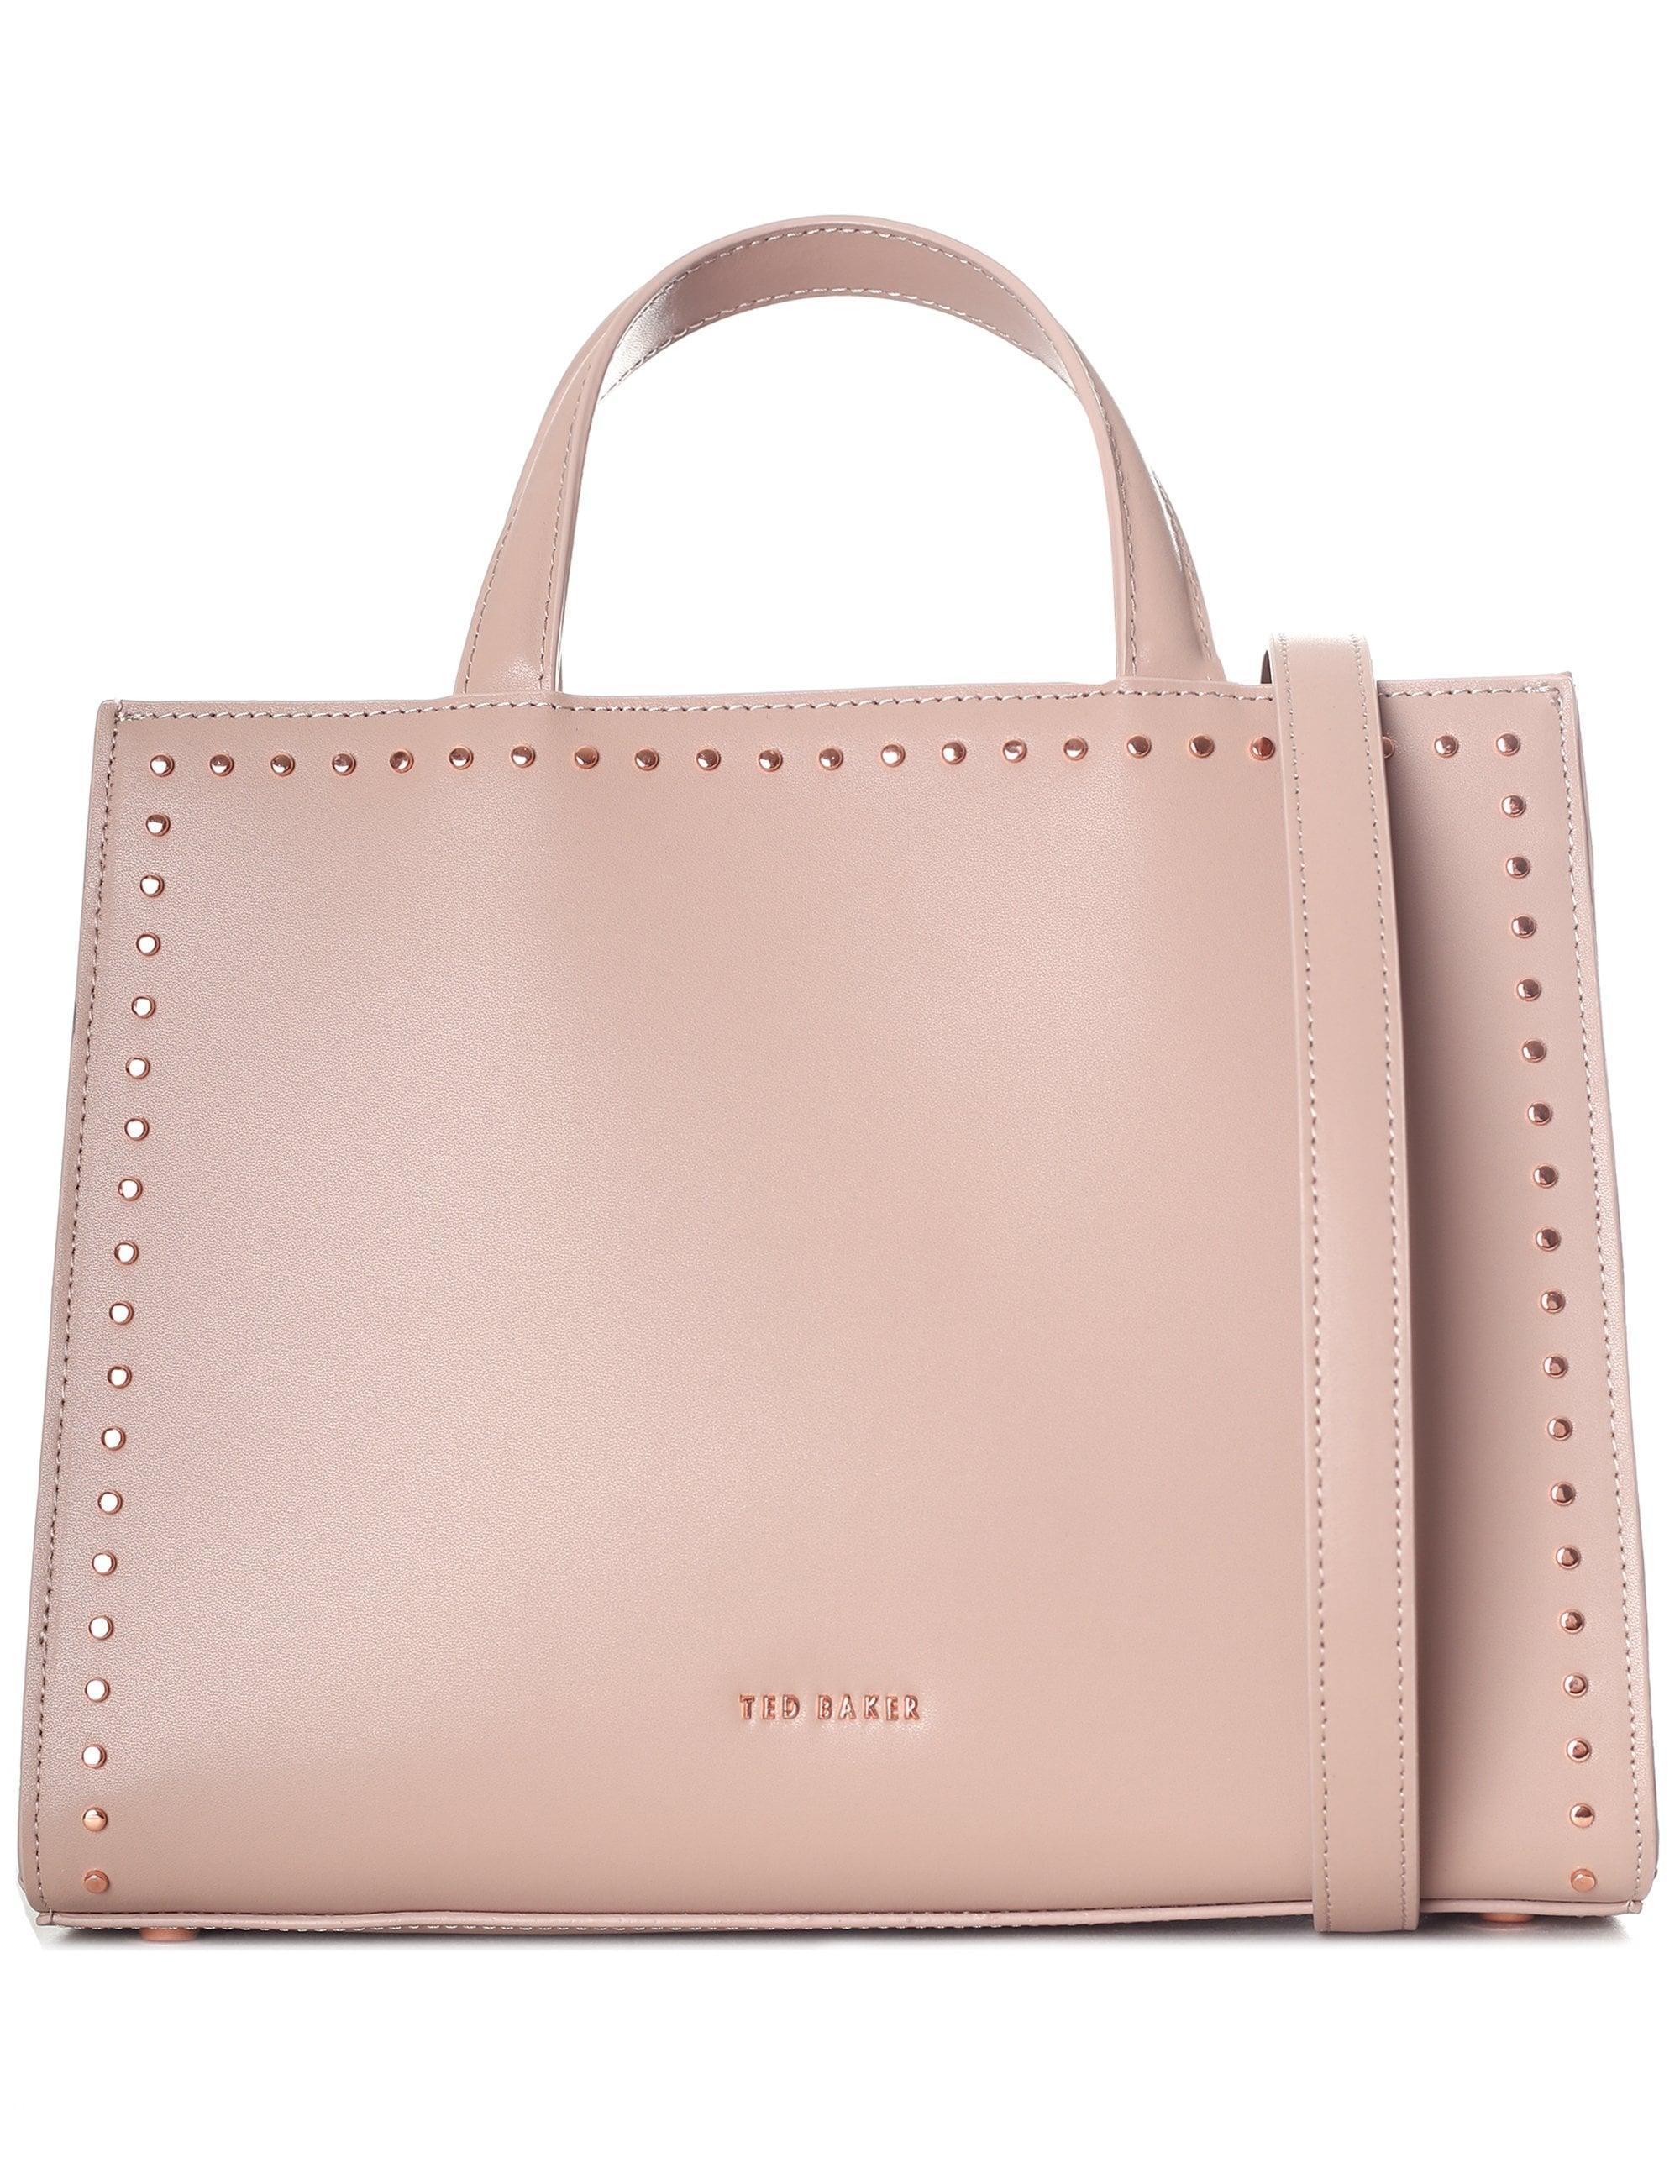 35c5f362f236 Ted Baker - Pink Women s Micro Stud Shoulder Bag - Lyst. View fullscreen